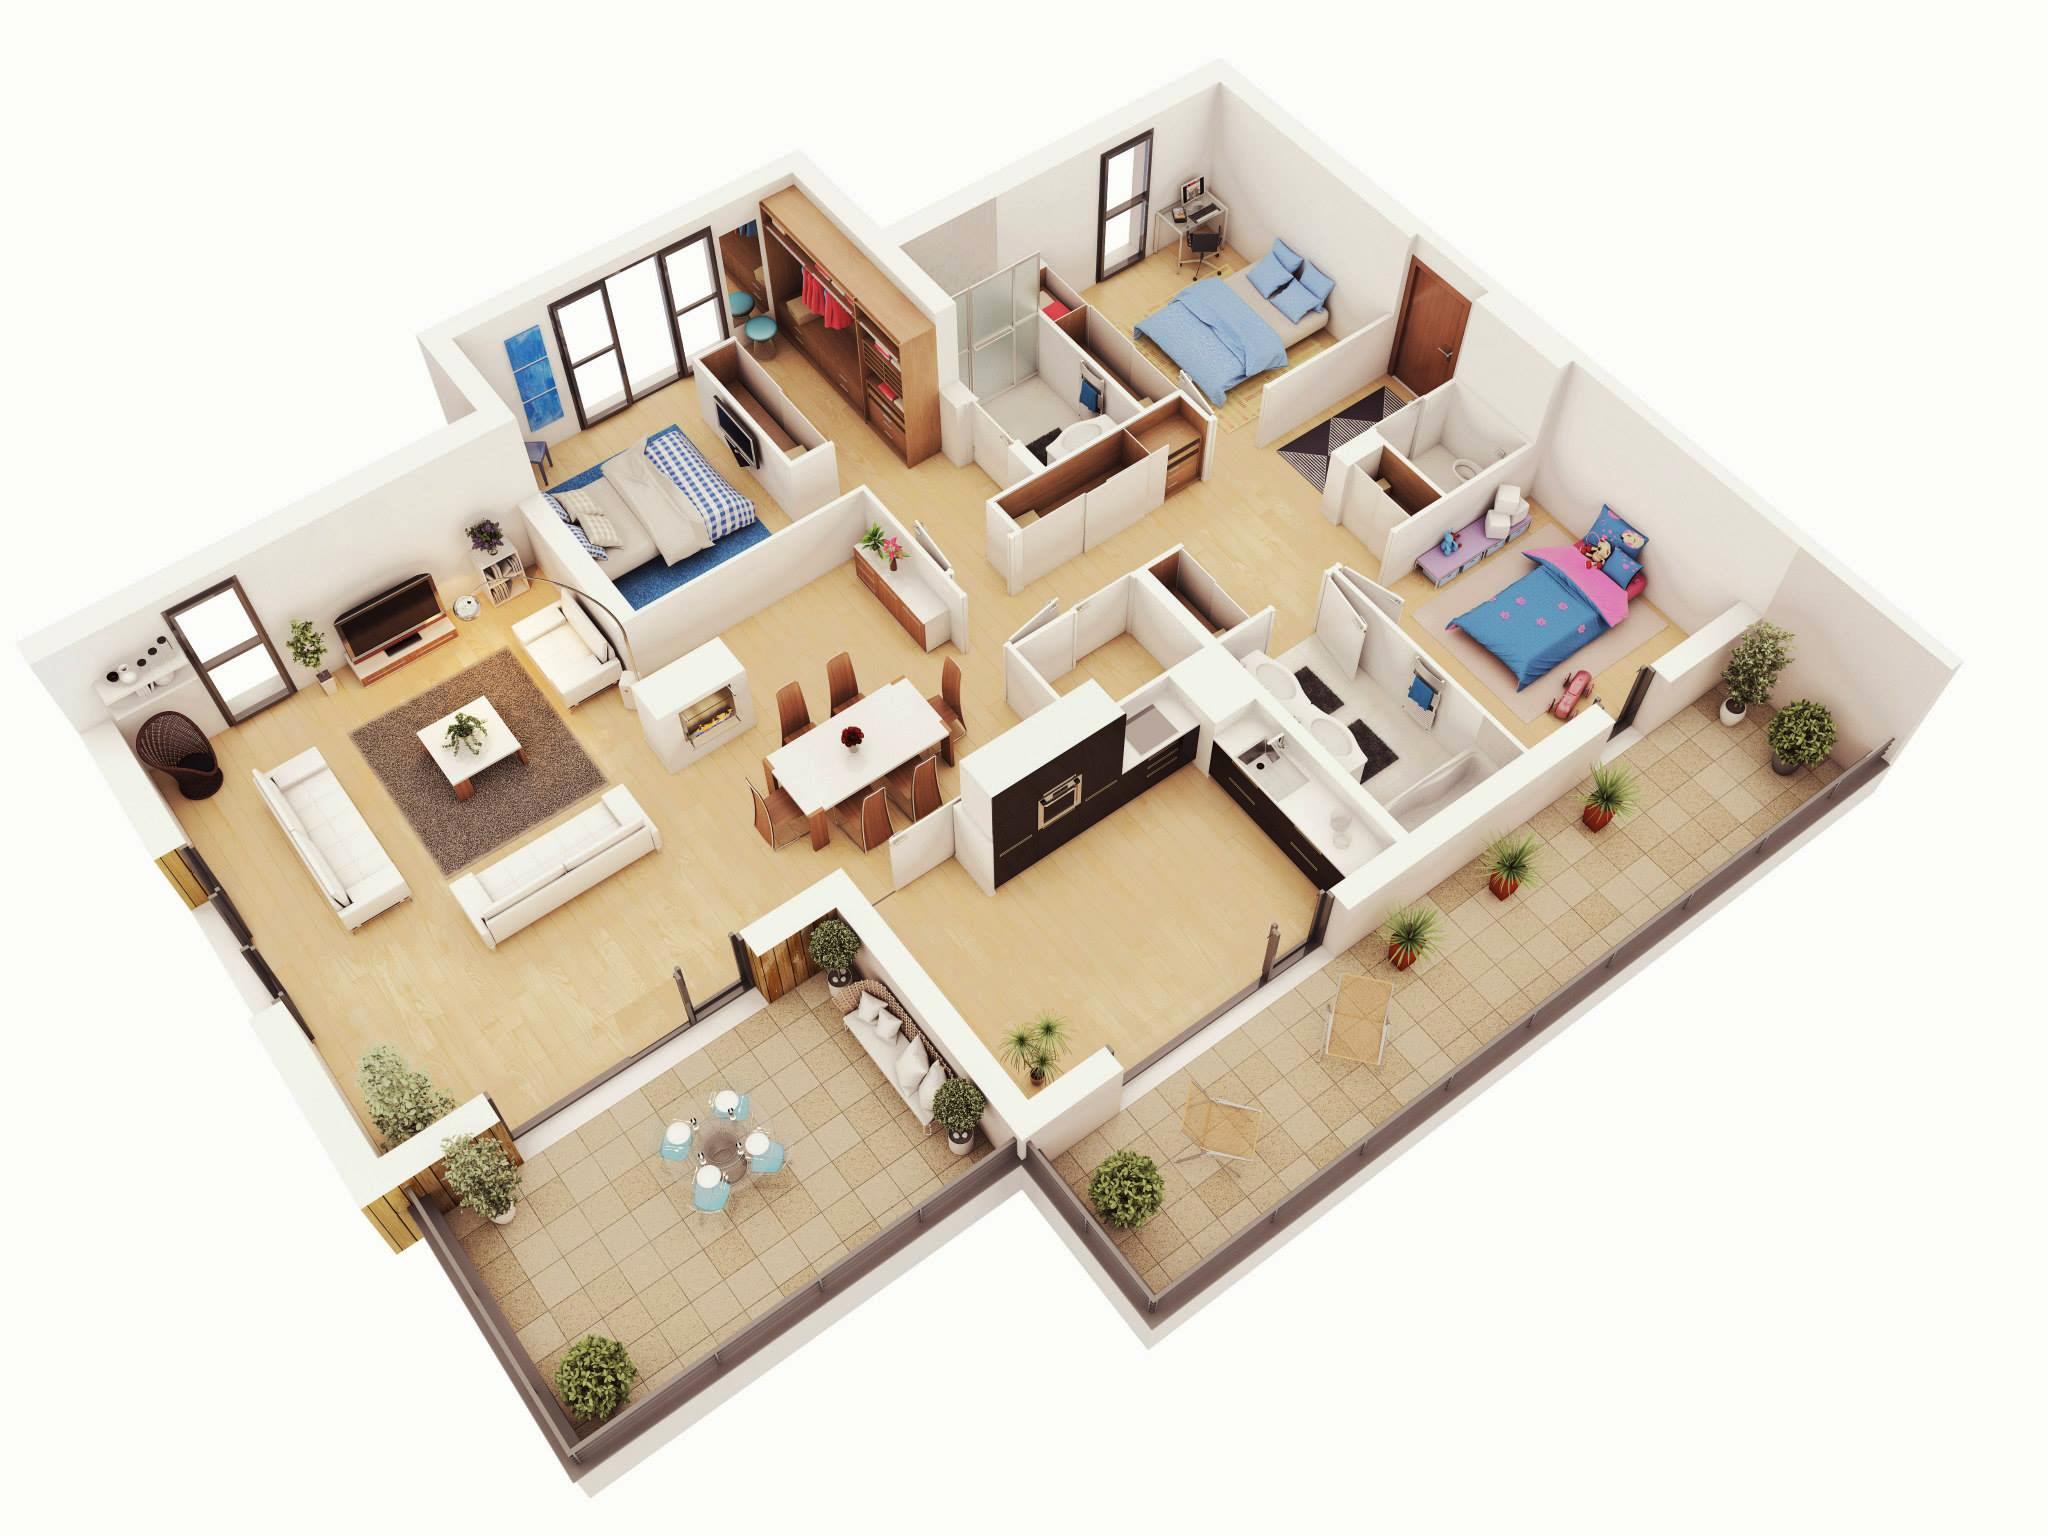 Drawn bedroom 3d classroom Architecture Plans Bedroom Design More